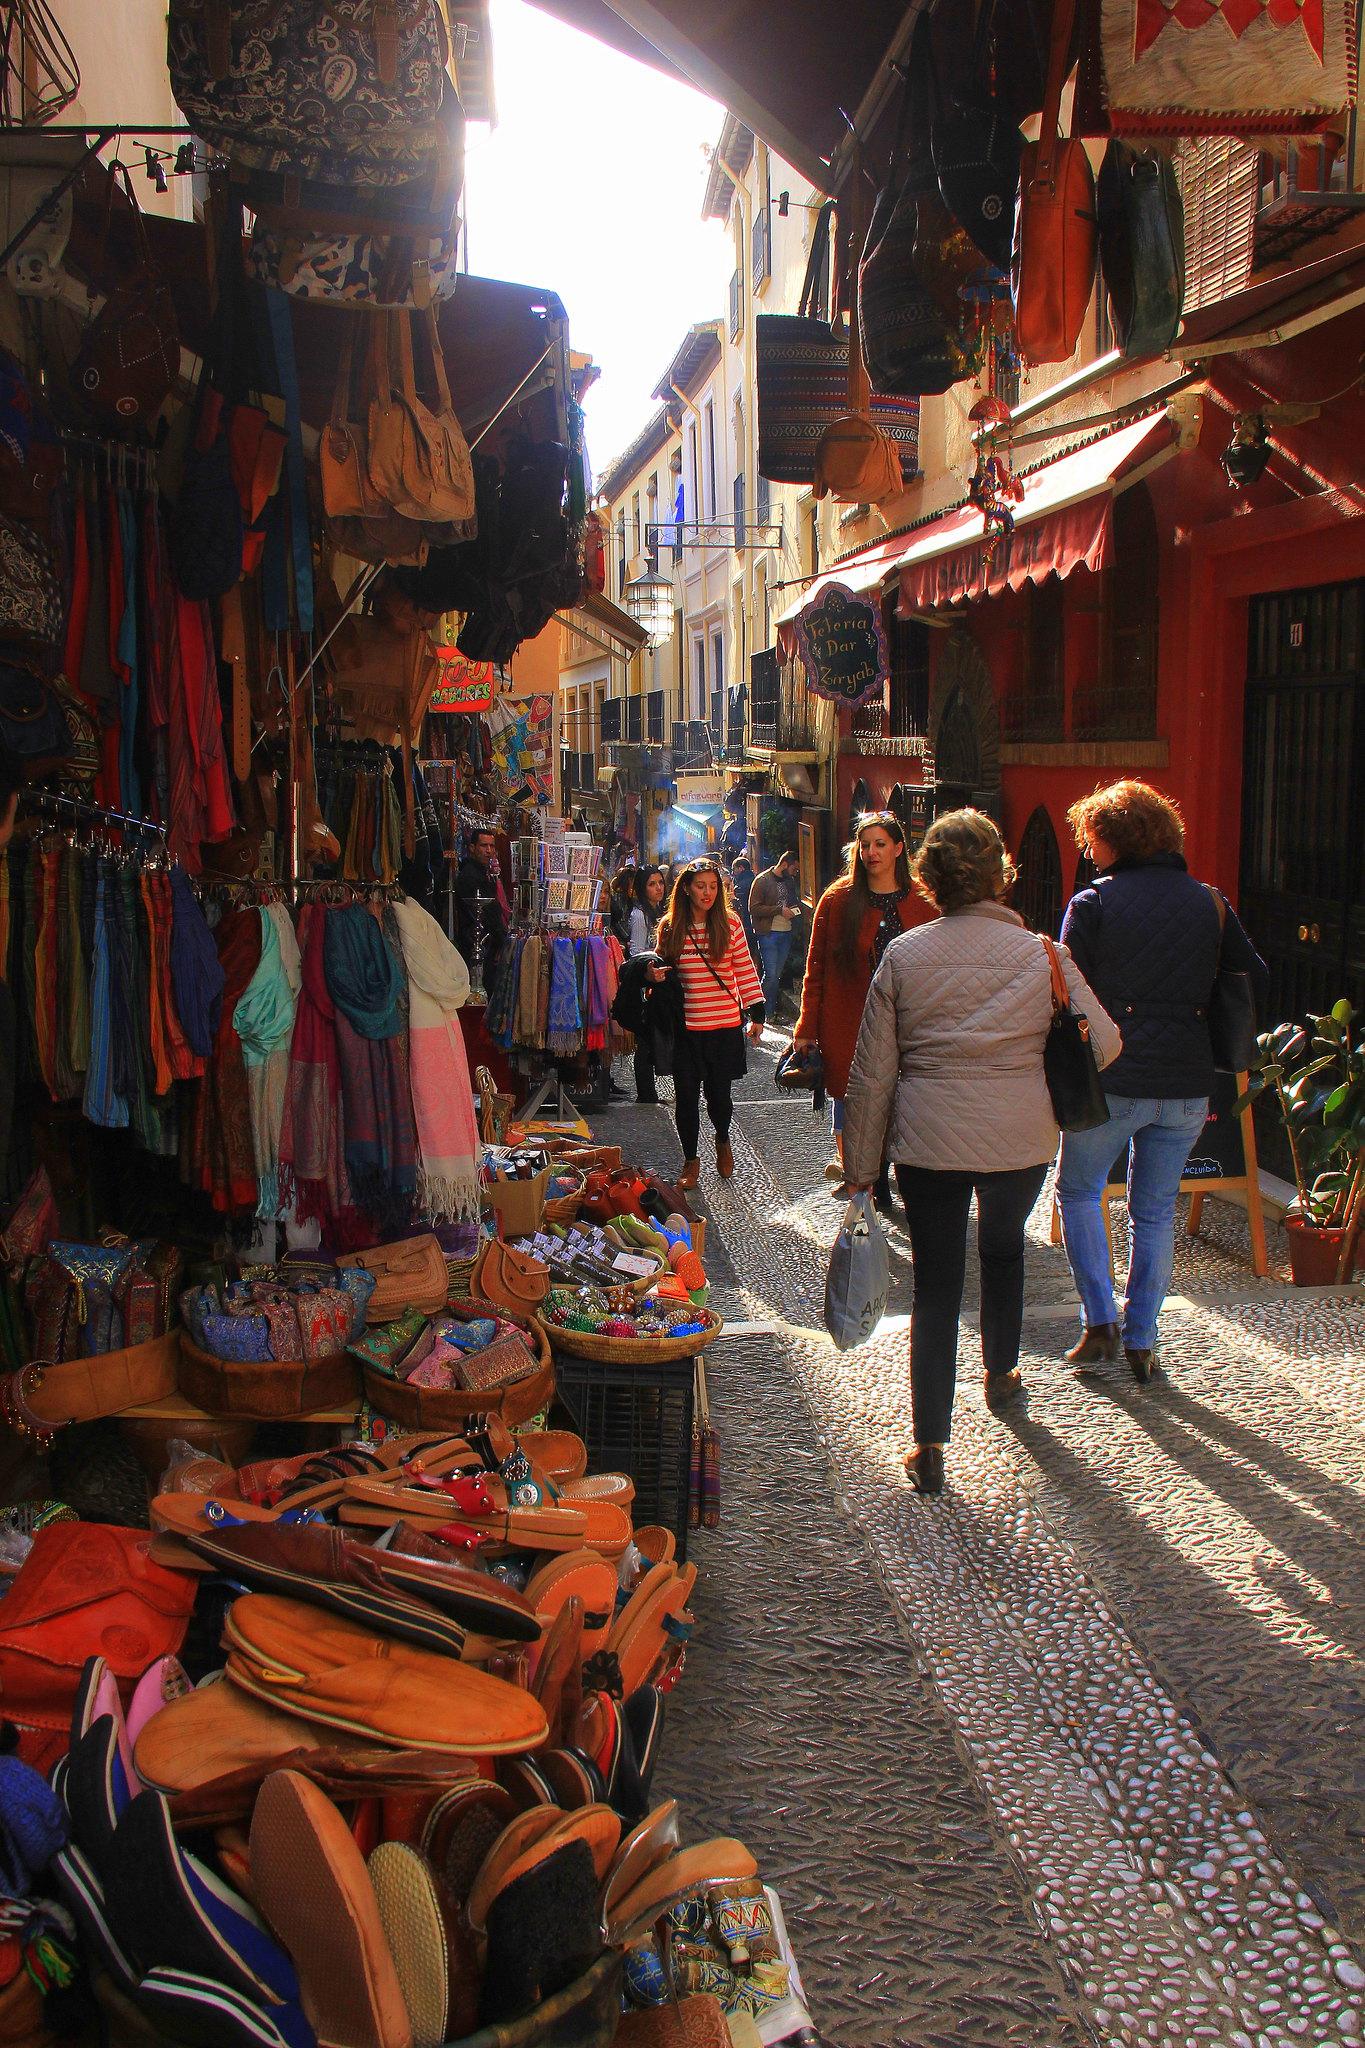 Grand old Granada is a Moorish dream